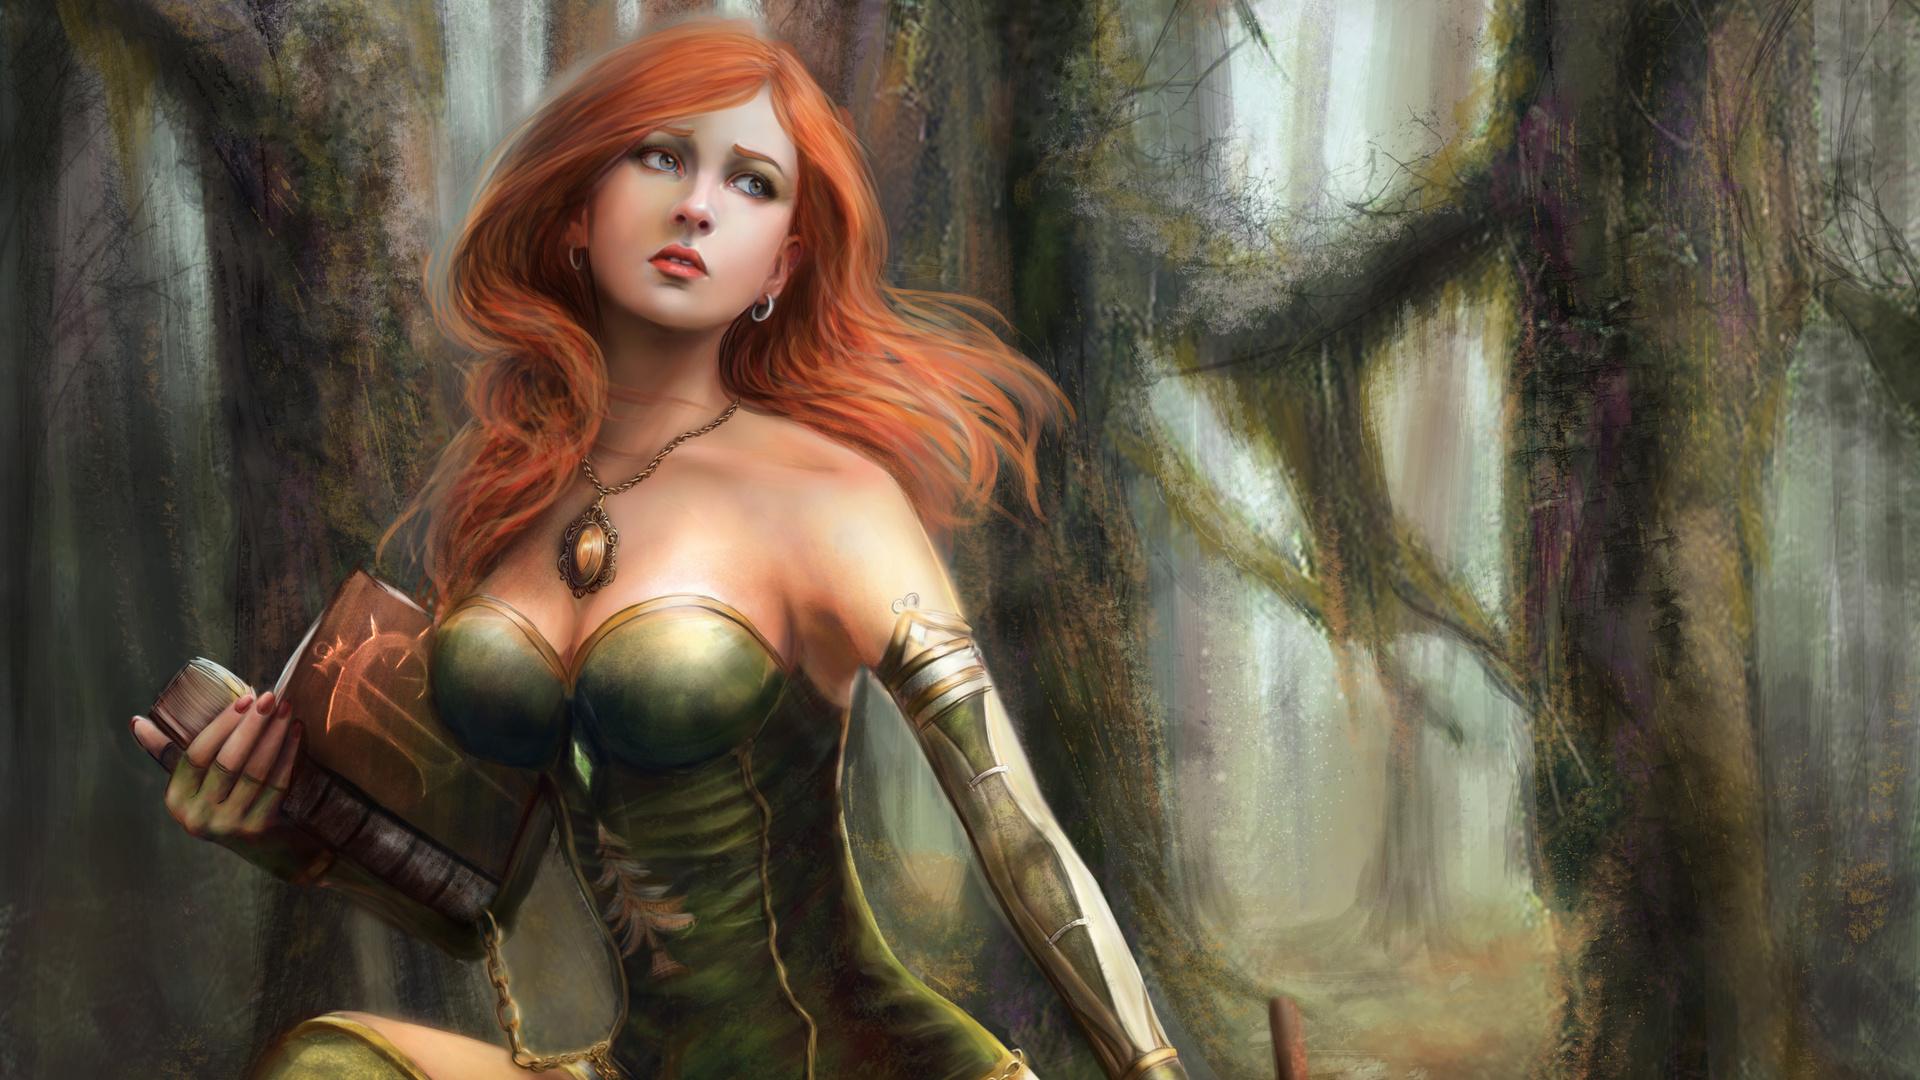 Warrior Woman Art - ID: 111323 - Art Abyss